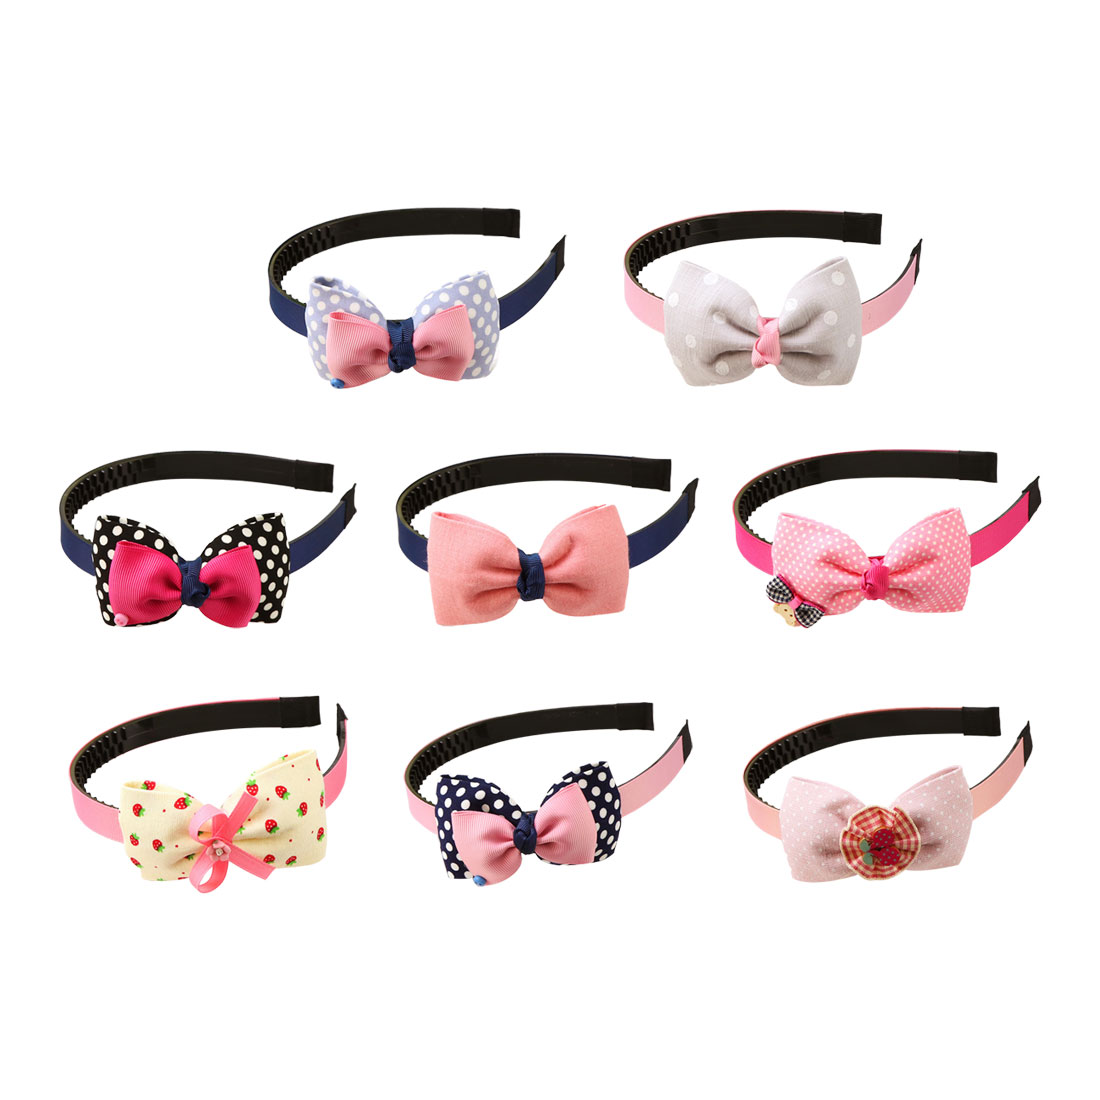 Children Plastic Headband Cute Big Bows Flower Spot Hairband Girls Lovely Hair Band Headwear